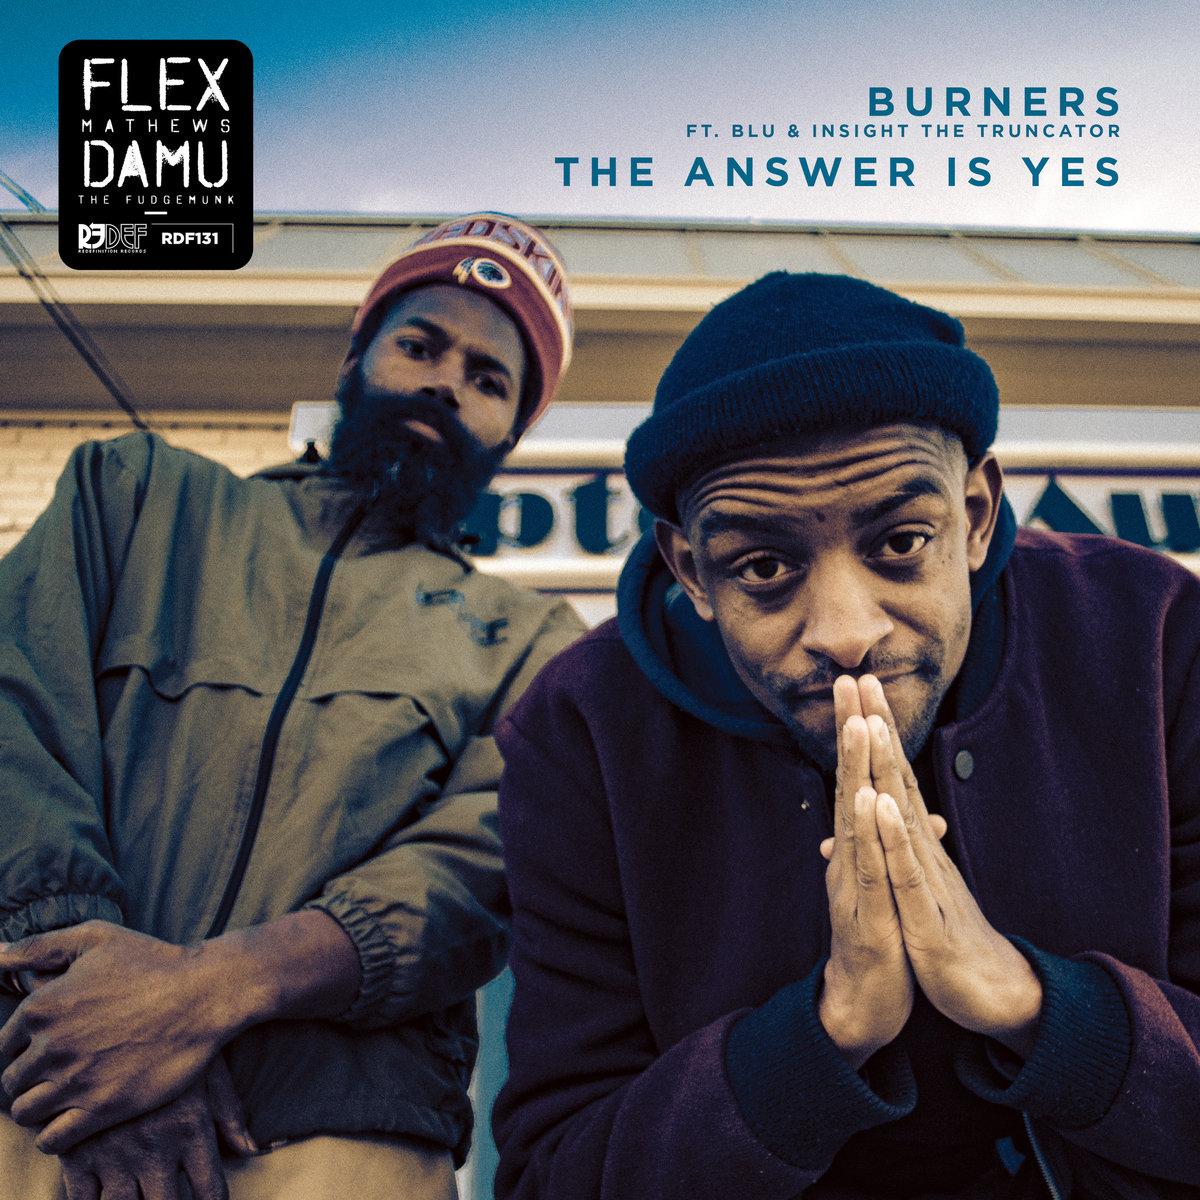 Damu_the_fudgemunk___flex_mathews_presentan__burners__ep__